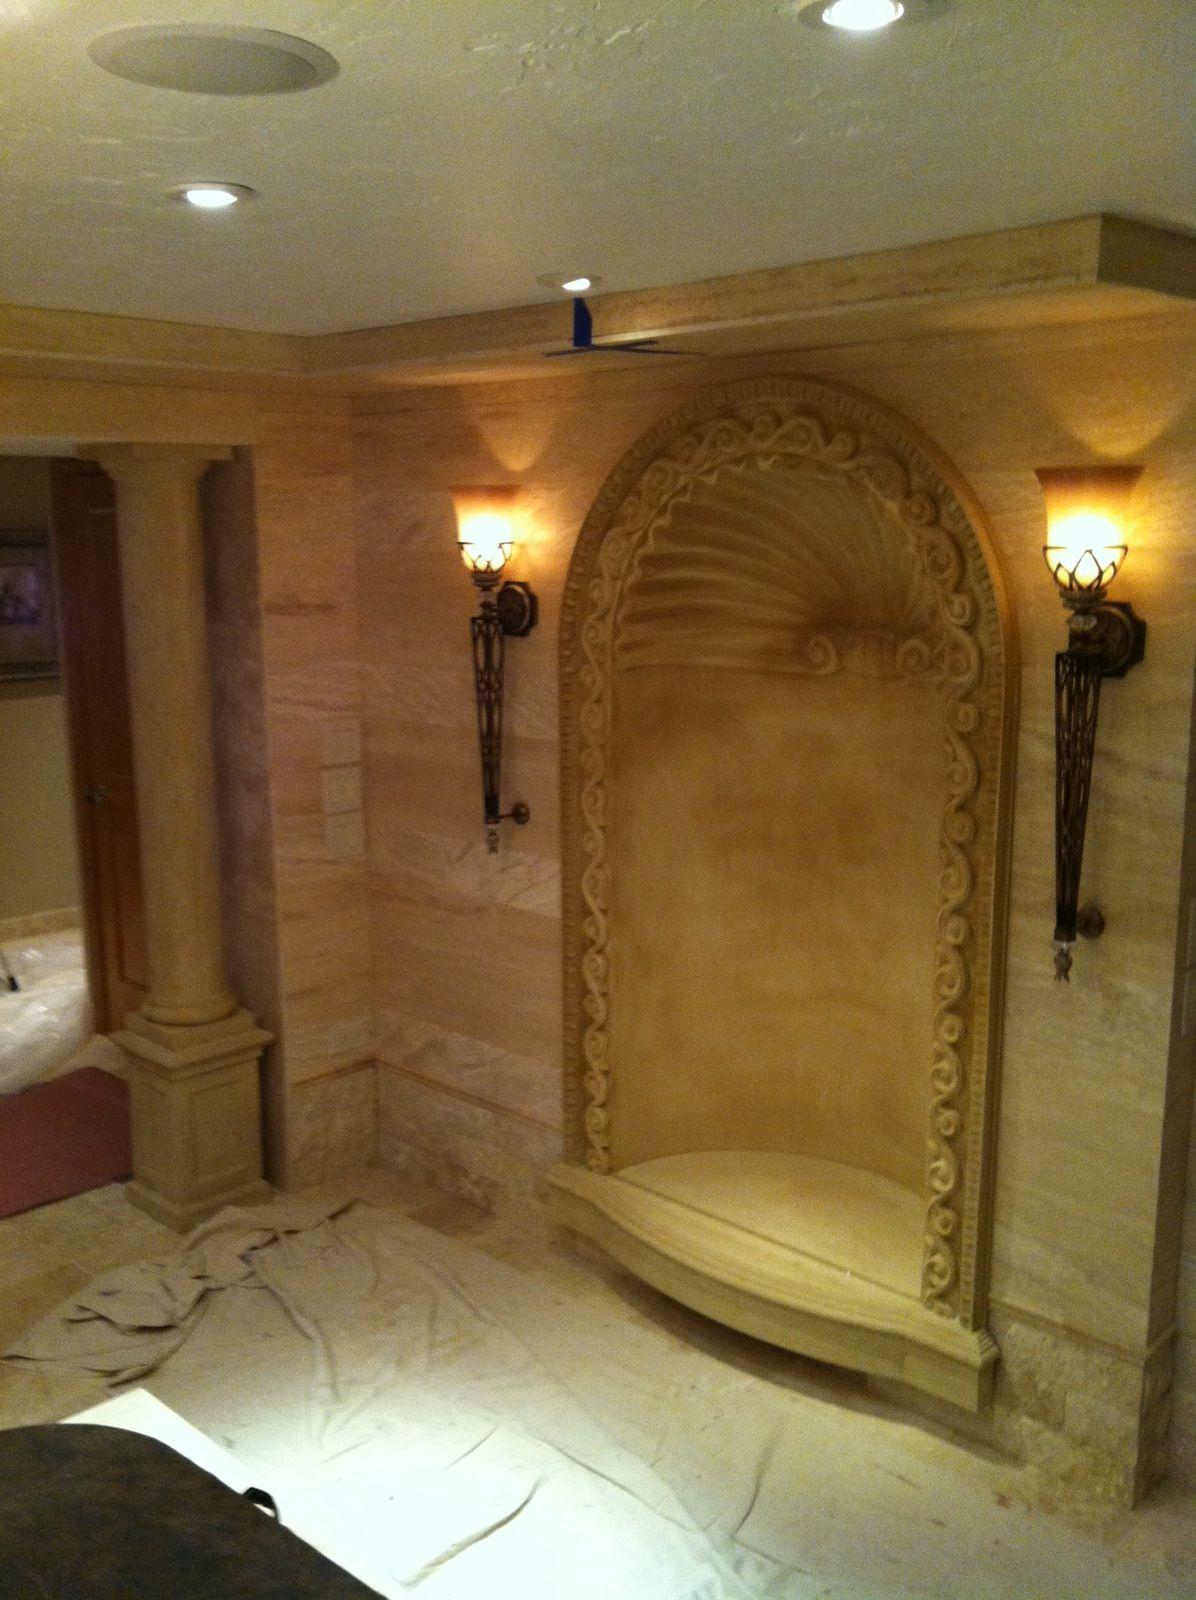 custom wall niche cast stone spa project precast decorate picture artisan kraft decor ideas. Black Bedroom Furniture Sets. Home Design Ideas